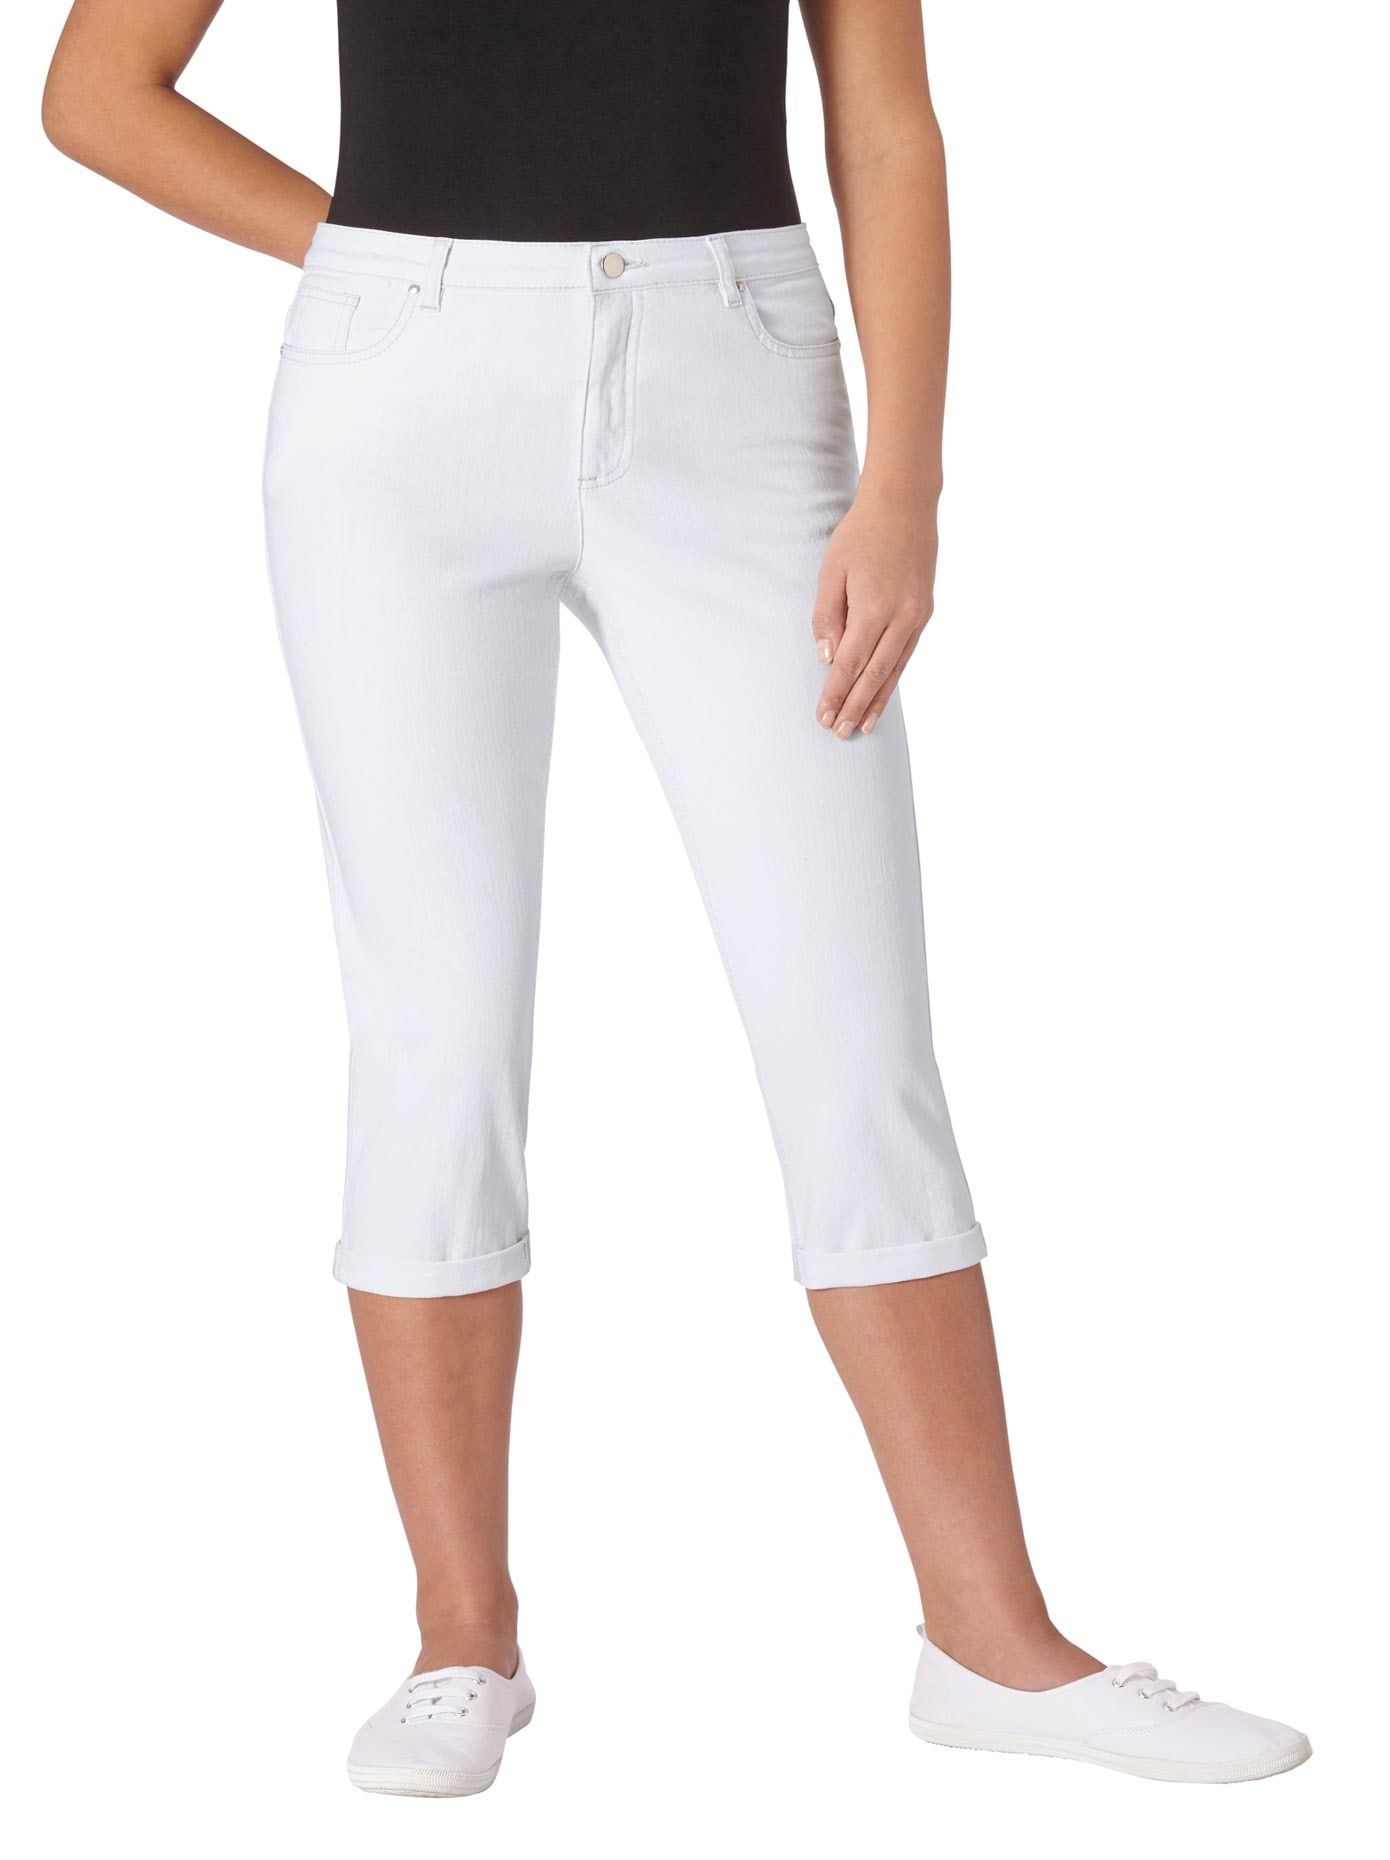 Casual Looks Capri-Hose in bequemer Stretch-Qualität | Bekleidung > Hosen > Caprihosen | Casual Looks